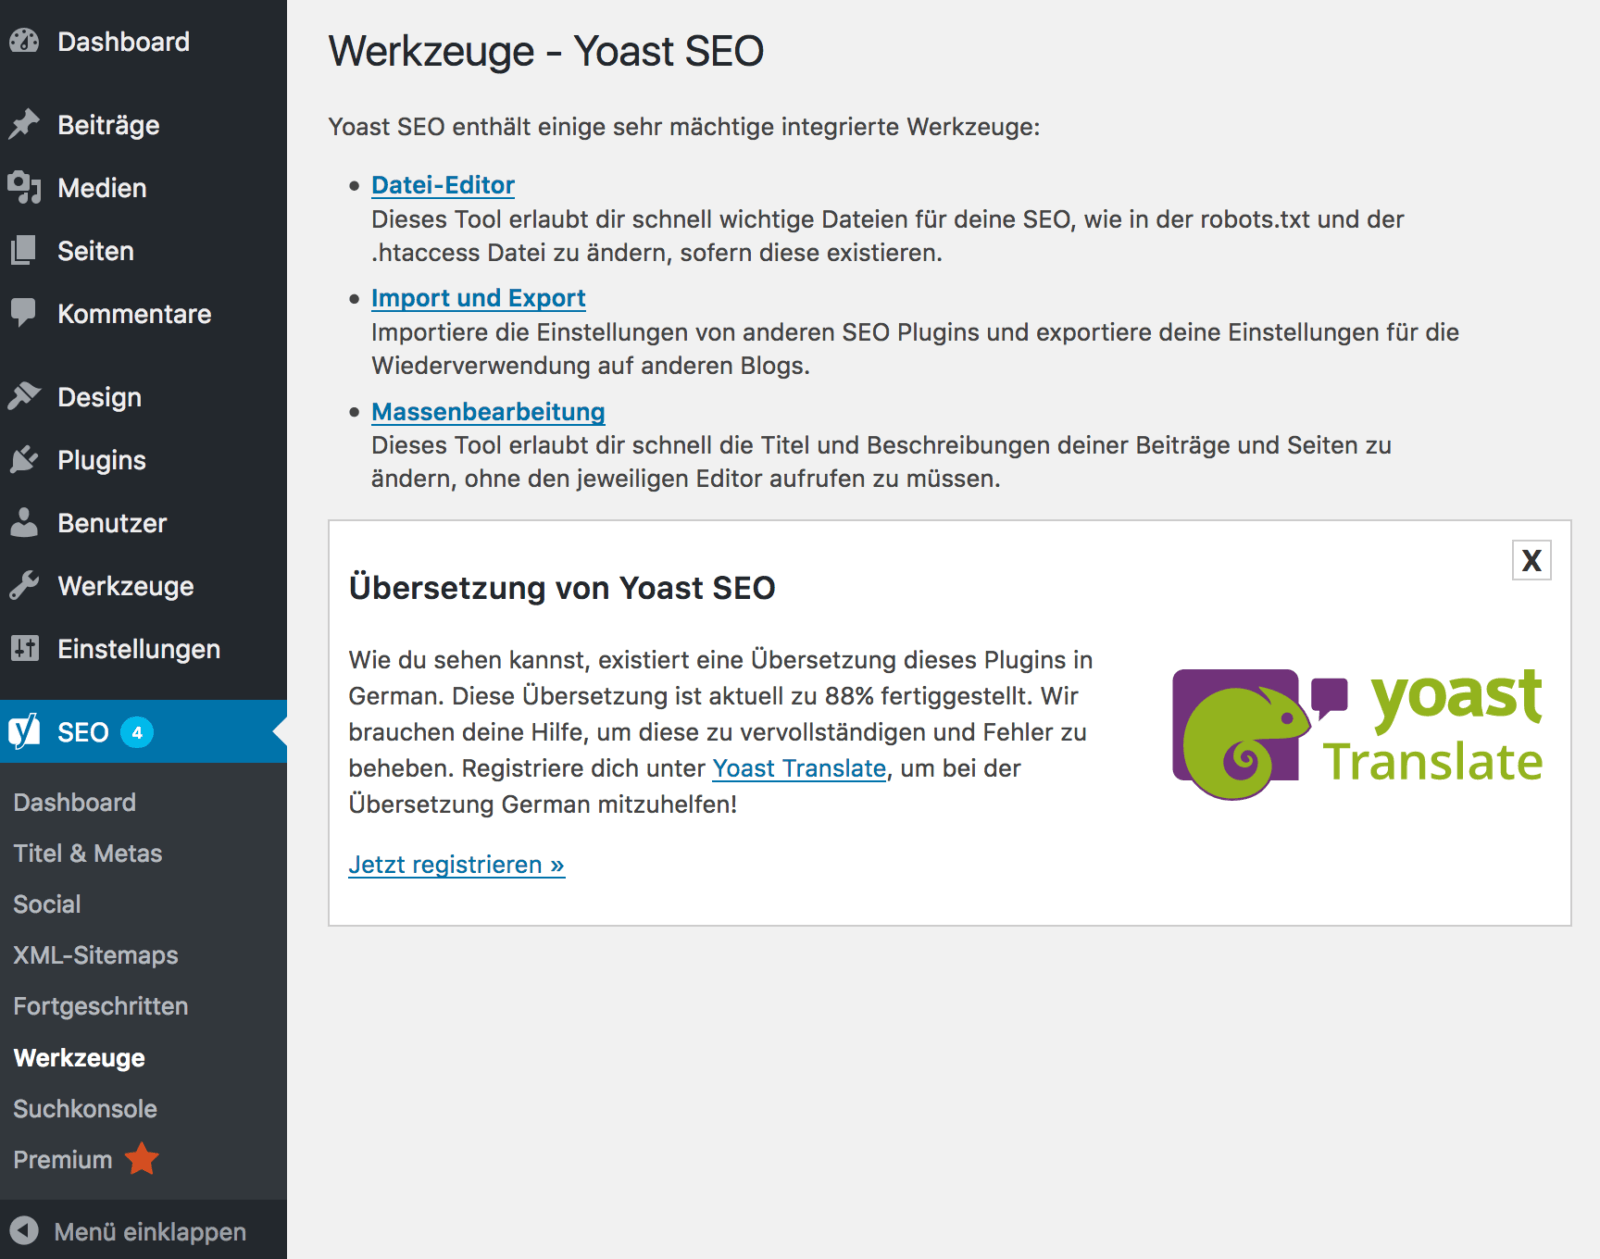 Yoast SEO Import von All in One SEO - Yoast Werkzeuge